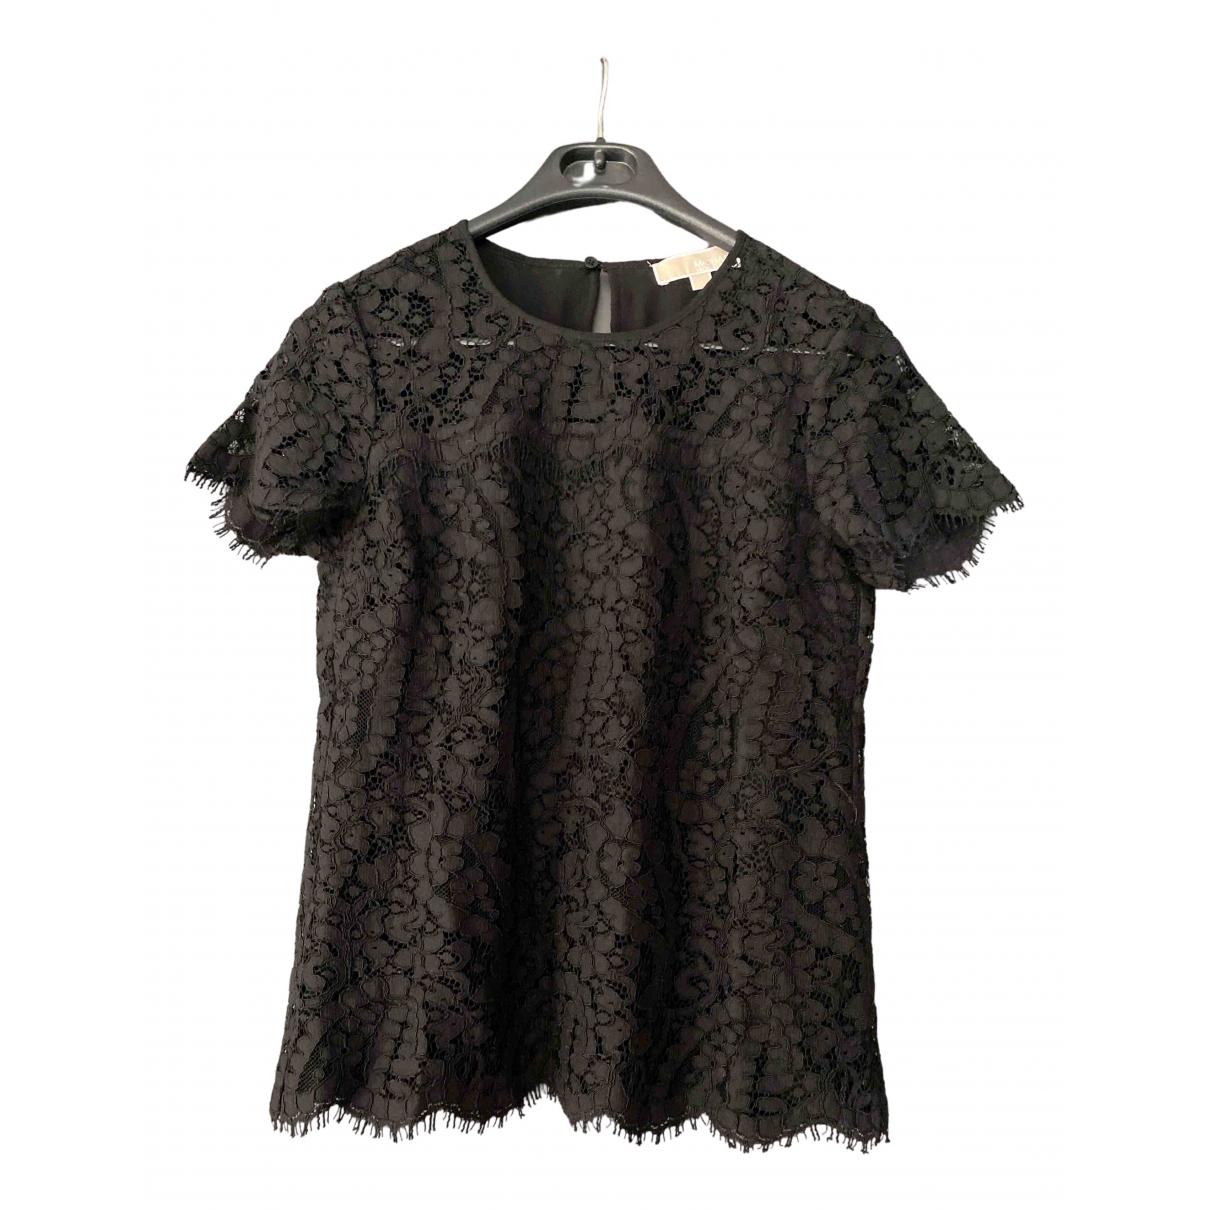 Michael Kors N Black Cotton  top for Women S International